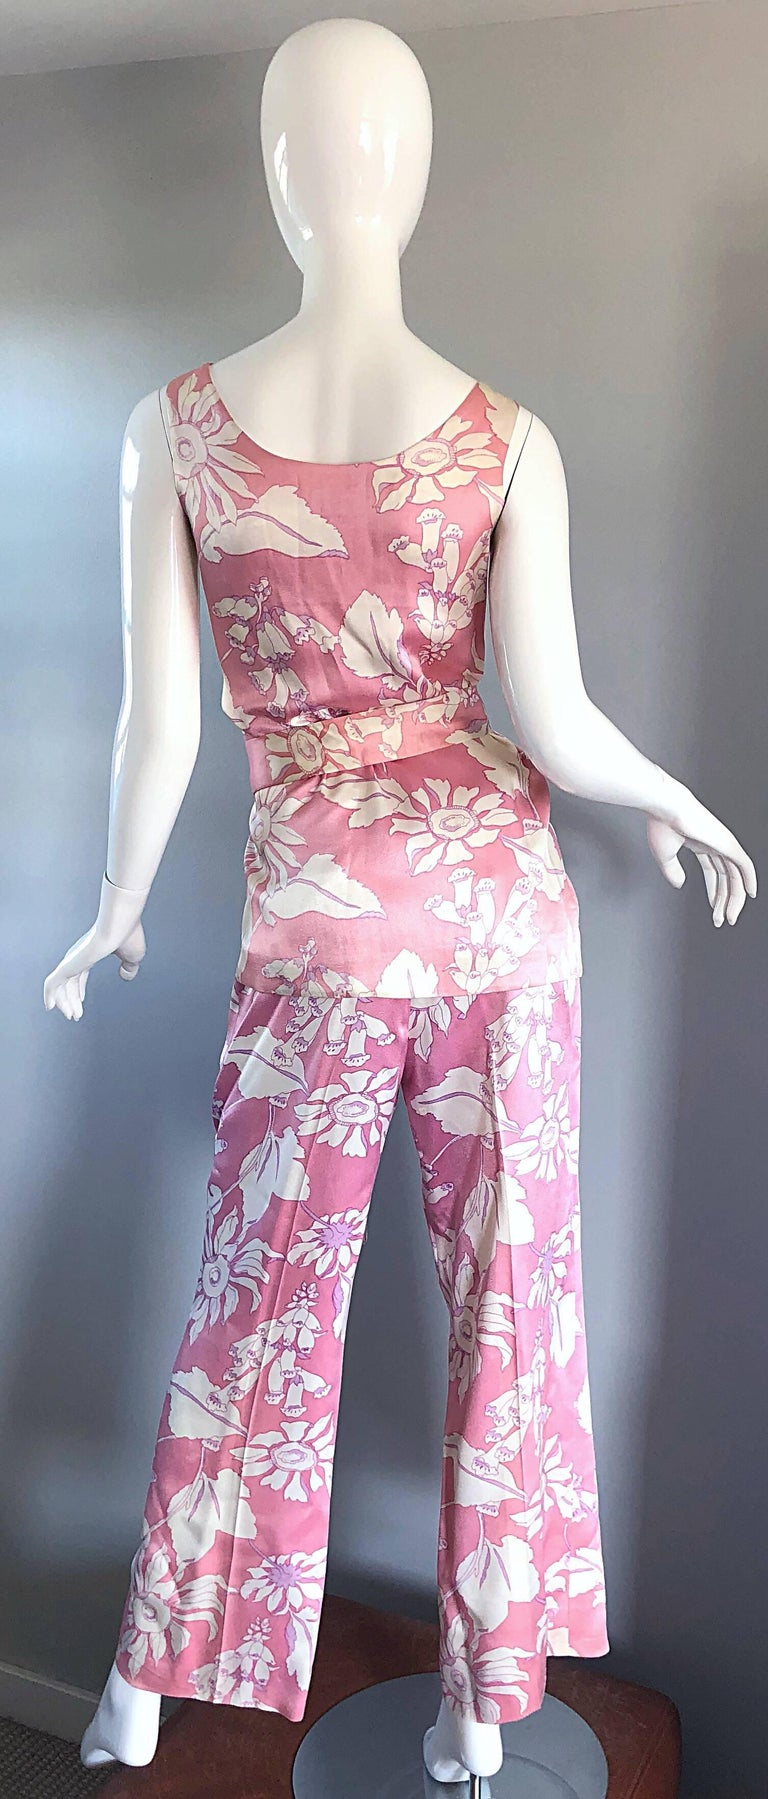 Women's Geoffrey Beene Vintage 1970s Pink + White Four Piece Silk Pants Top Belt & Shawl For Sale